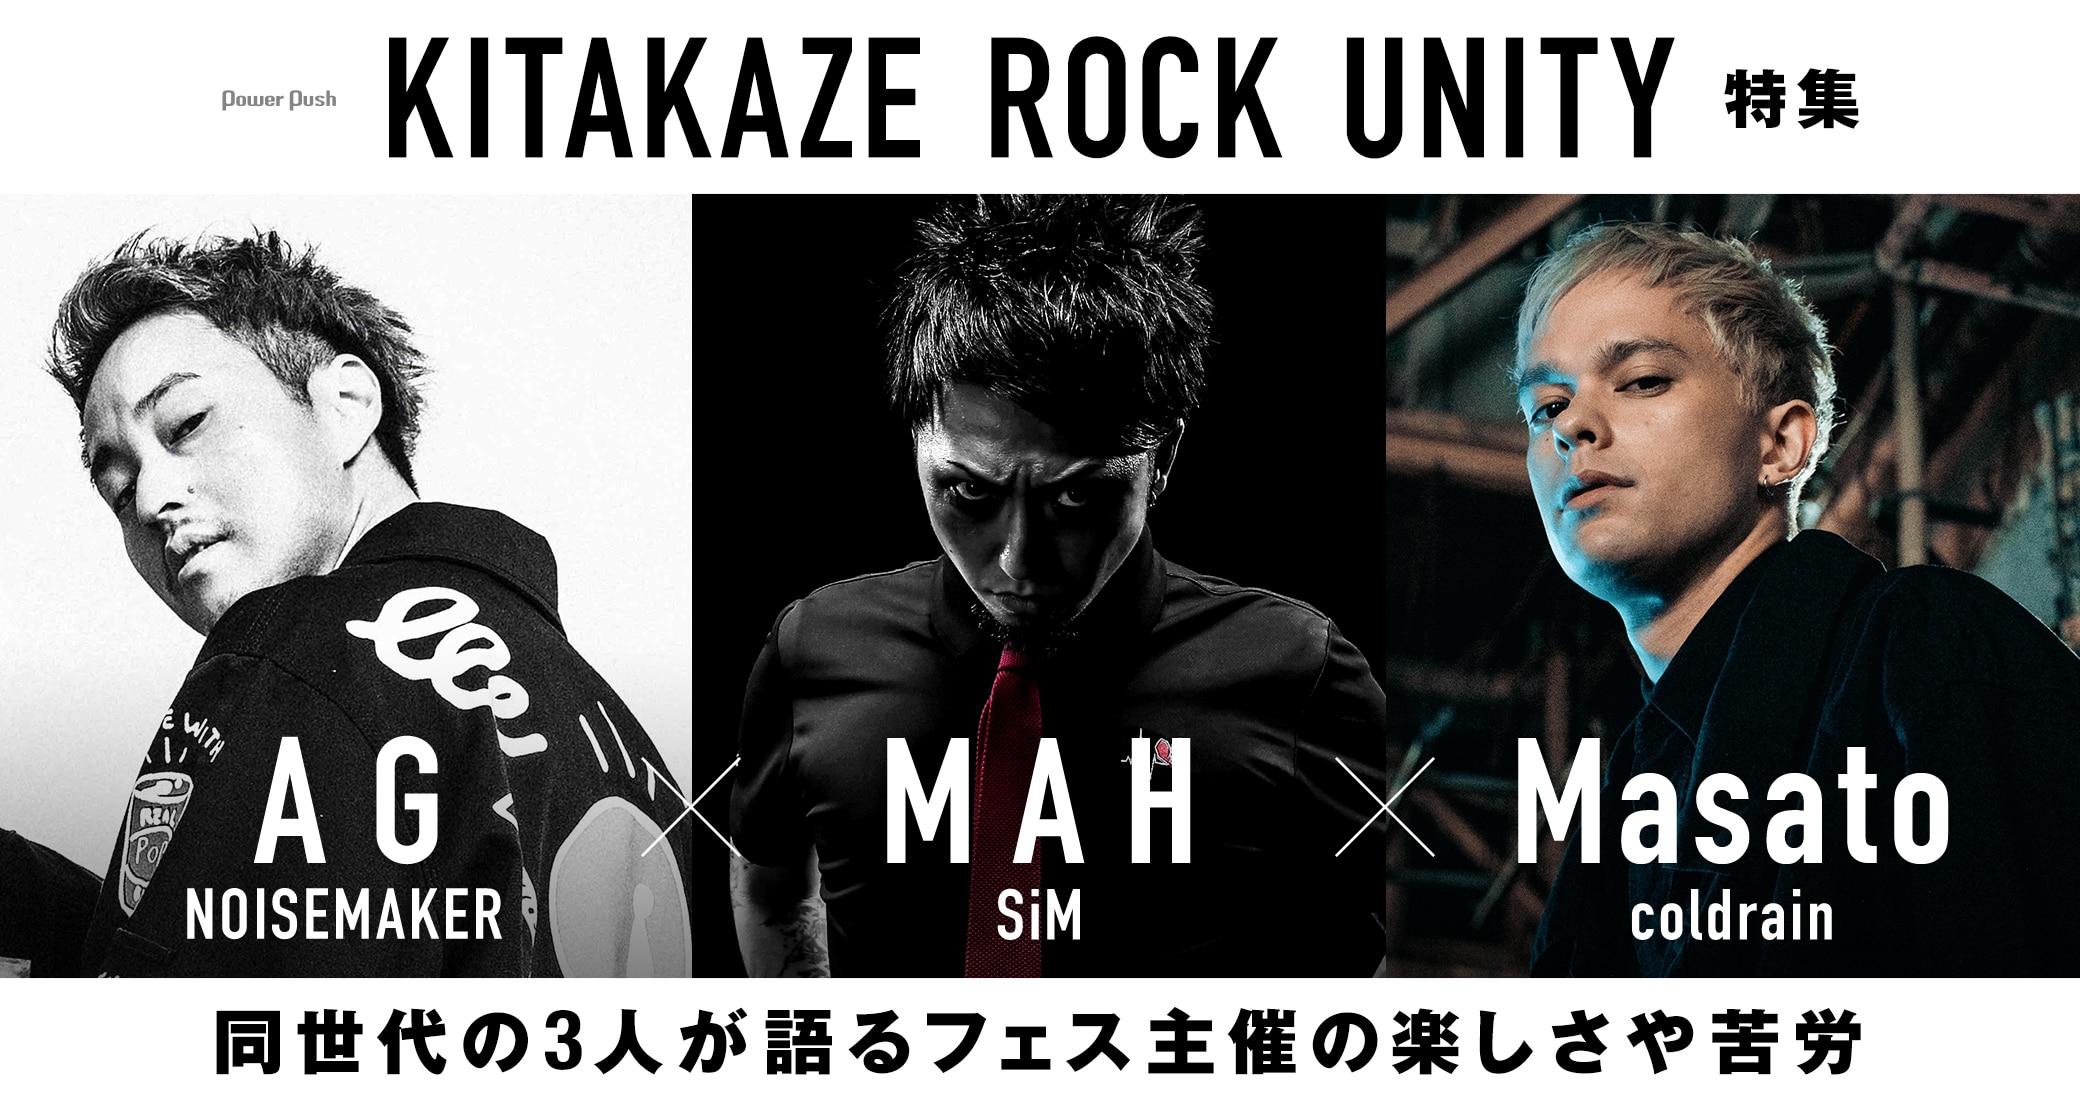 「KITAKAZE ROCK UNITY」特集|AG(NOISEMAKER)×MAH(SiM)×Masato(coldrain)同世代の3人が語るフェス主催の楽しさや苦労